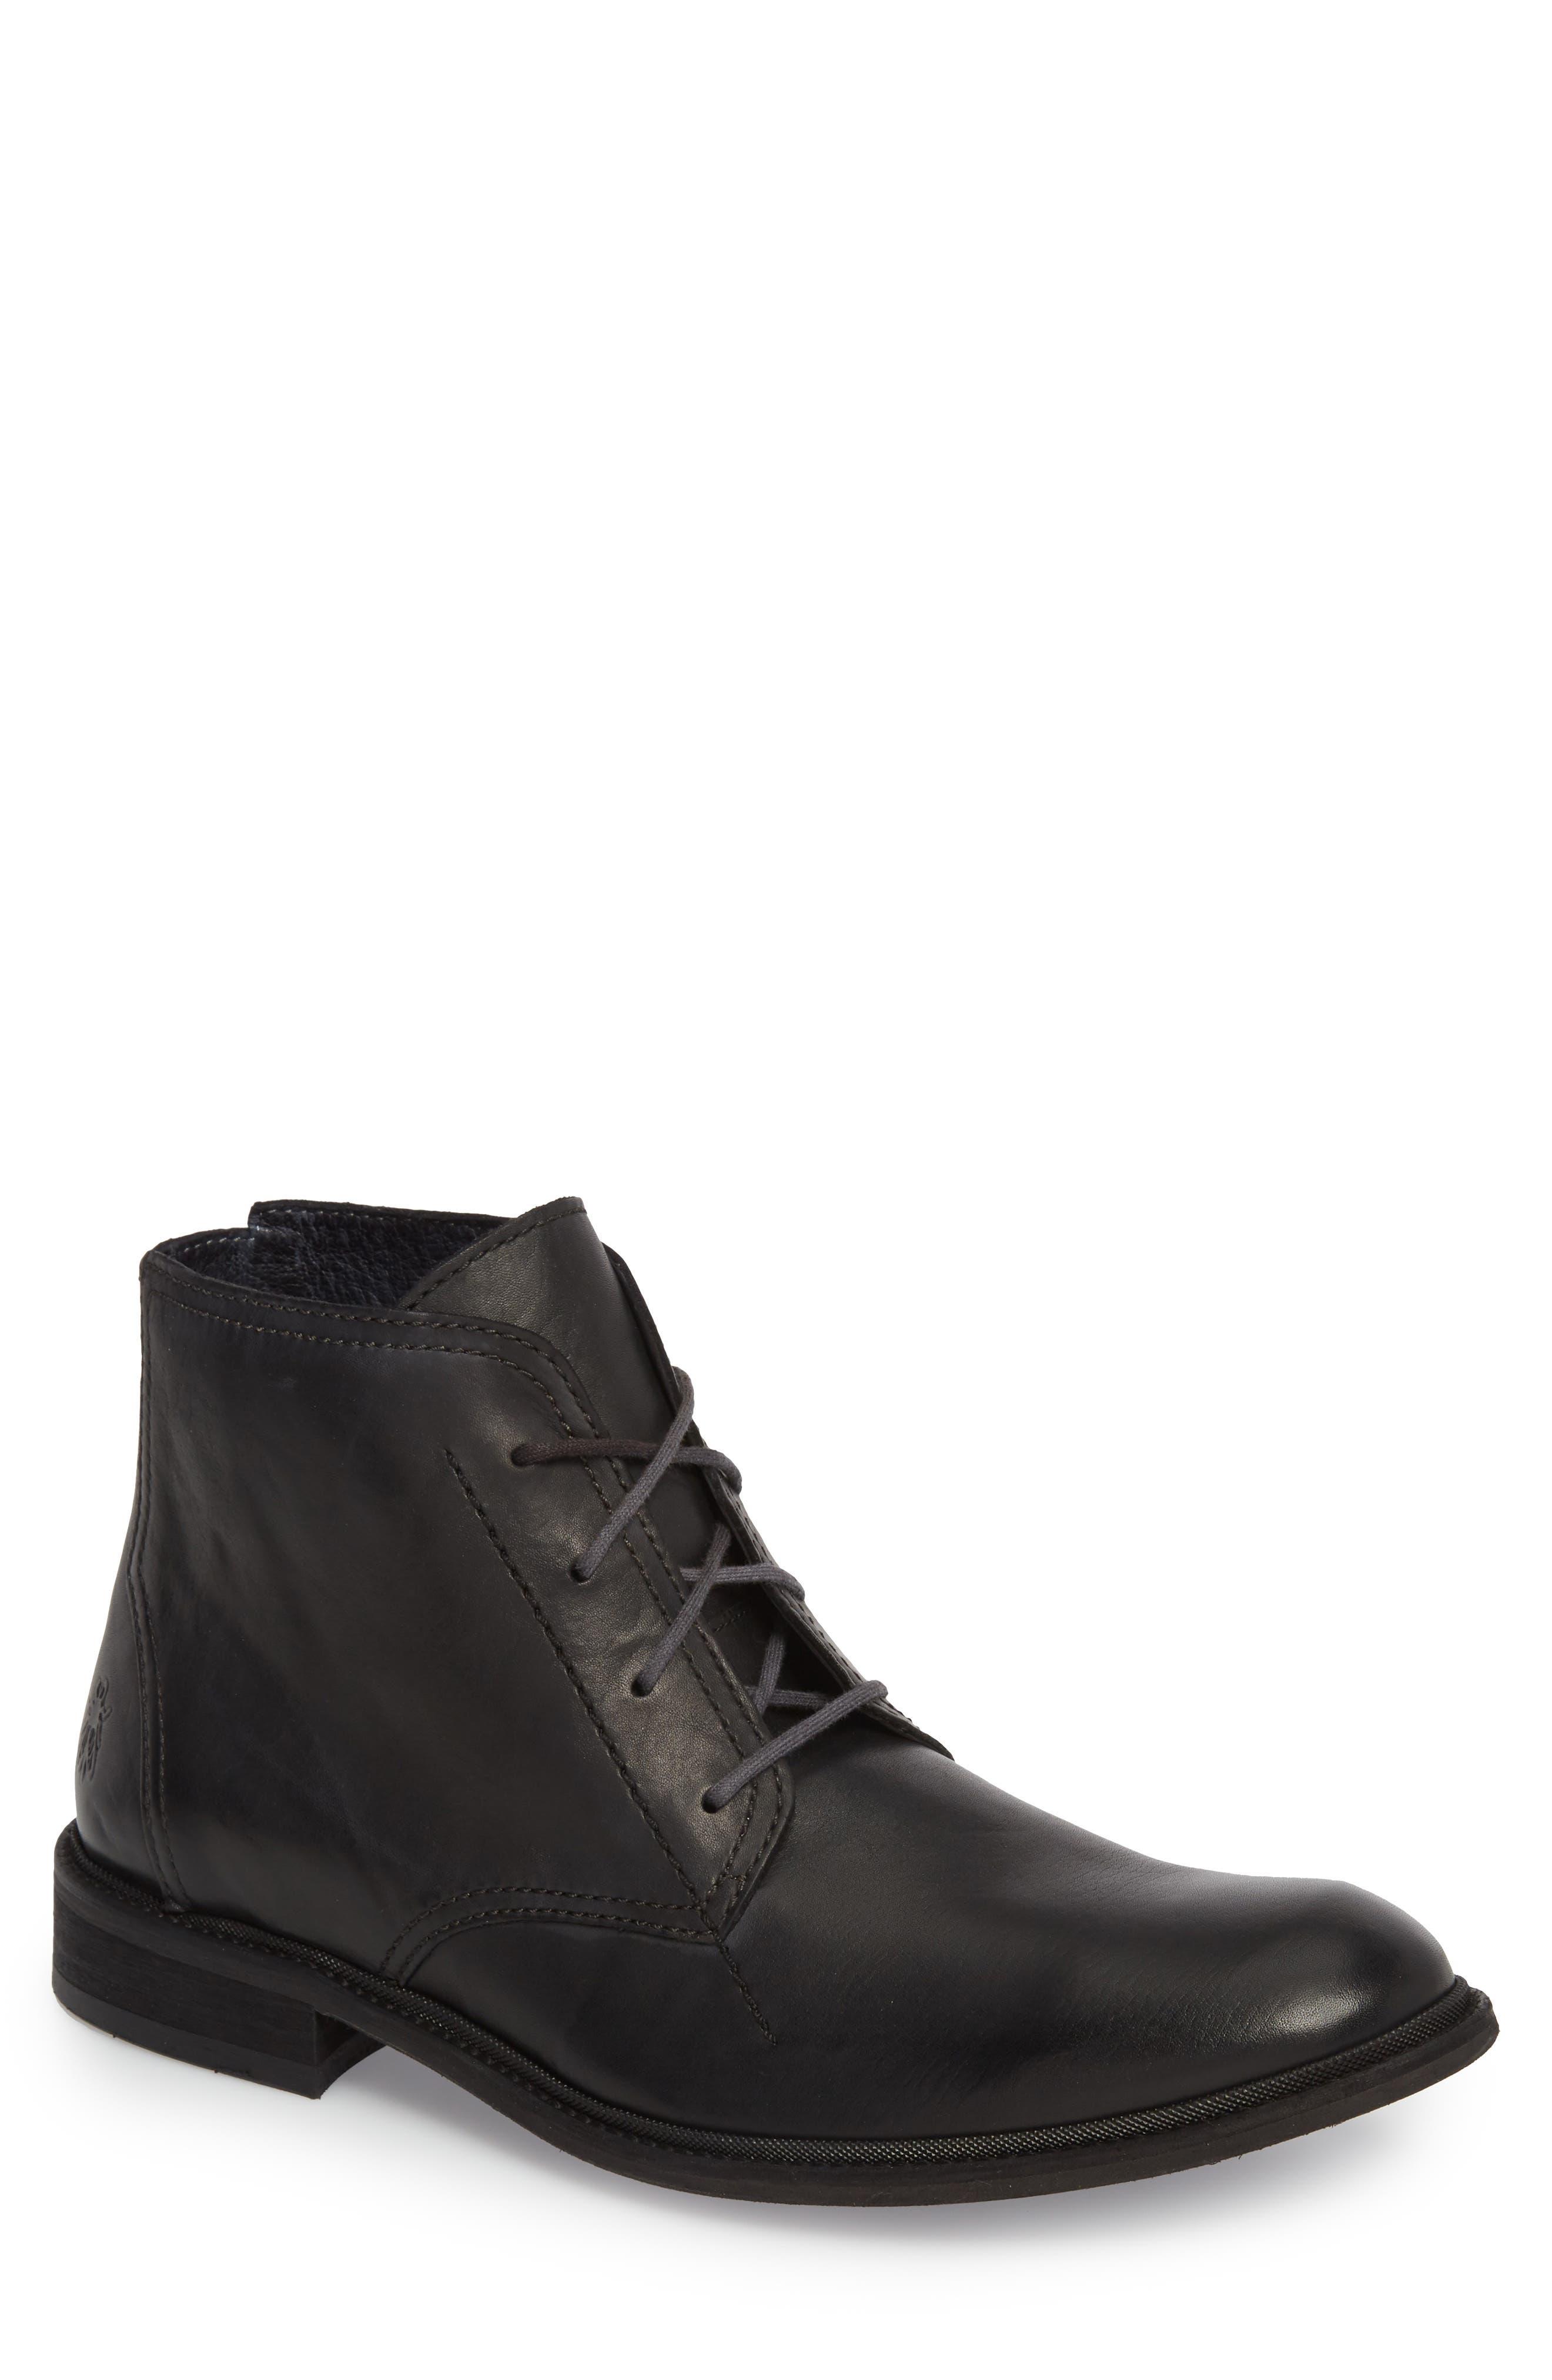 Hobi Plain Toe Chukka Boot,                         Main,                         color, Black Leather